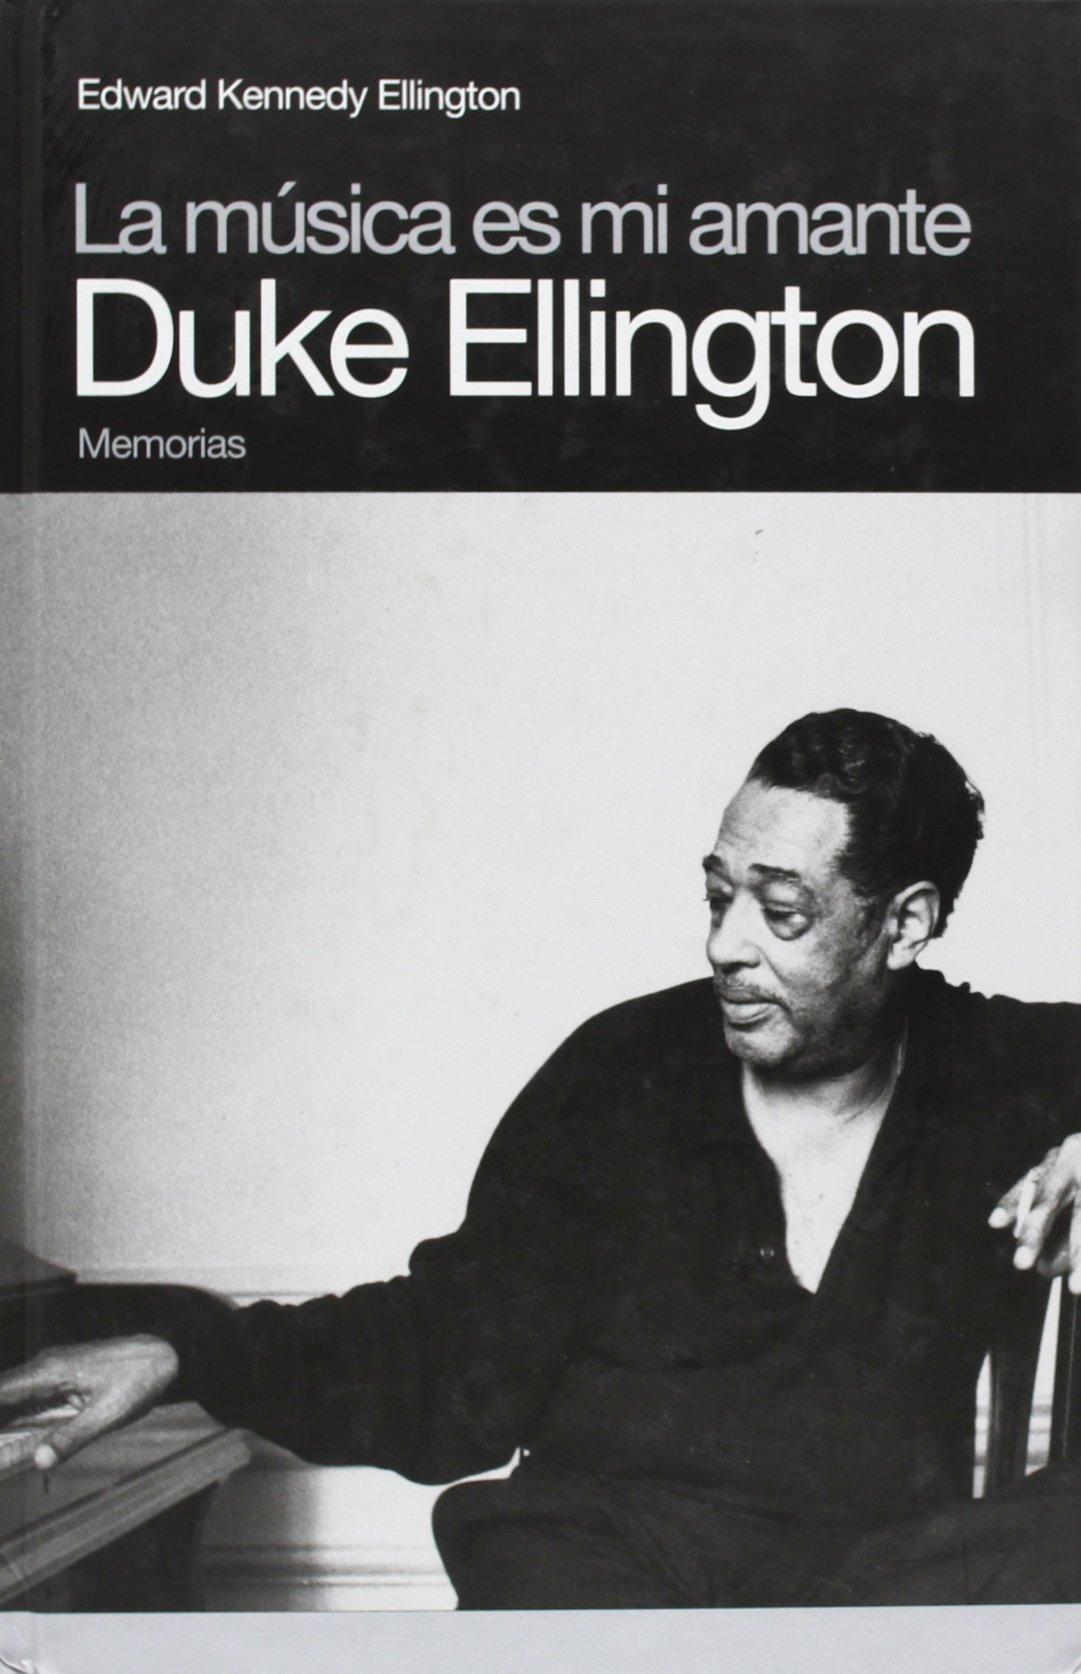 Duke Ellington: La música es mi amante (Memorias): Amazon.es: Edward Kennedy Ellington, Antonio Padilla Esteban: Libros